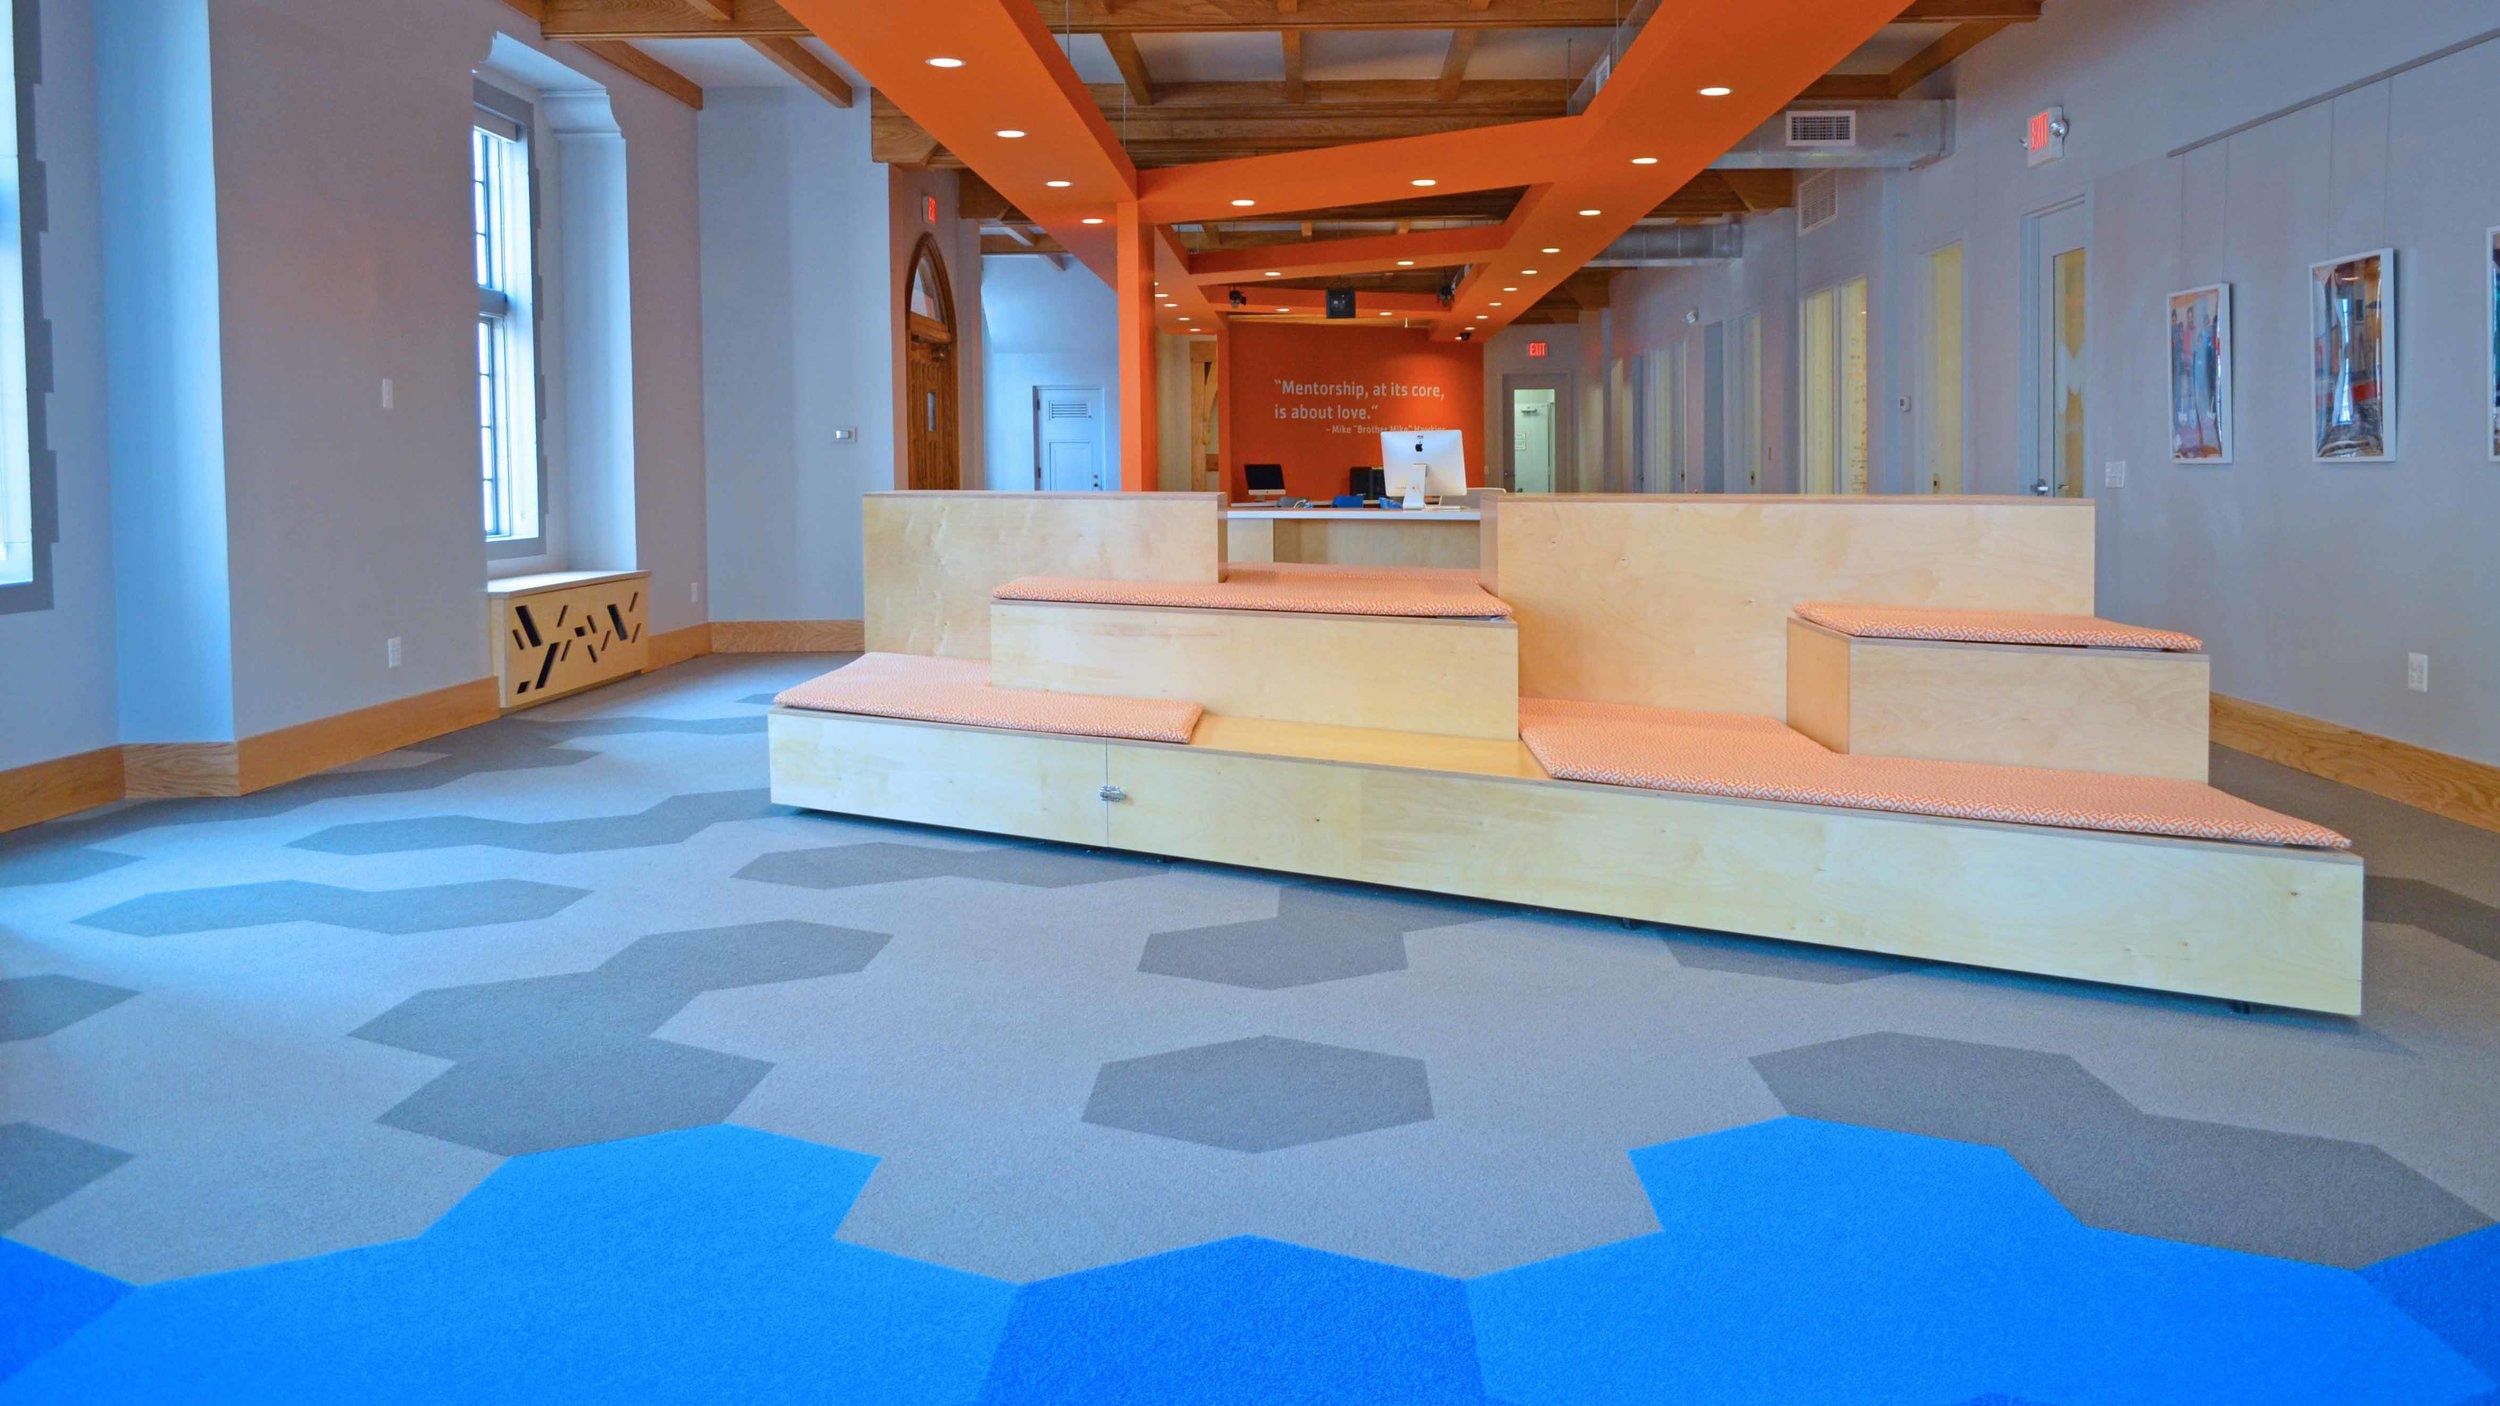 YMCA Meta_Interior 01.jpg